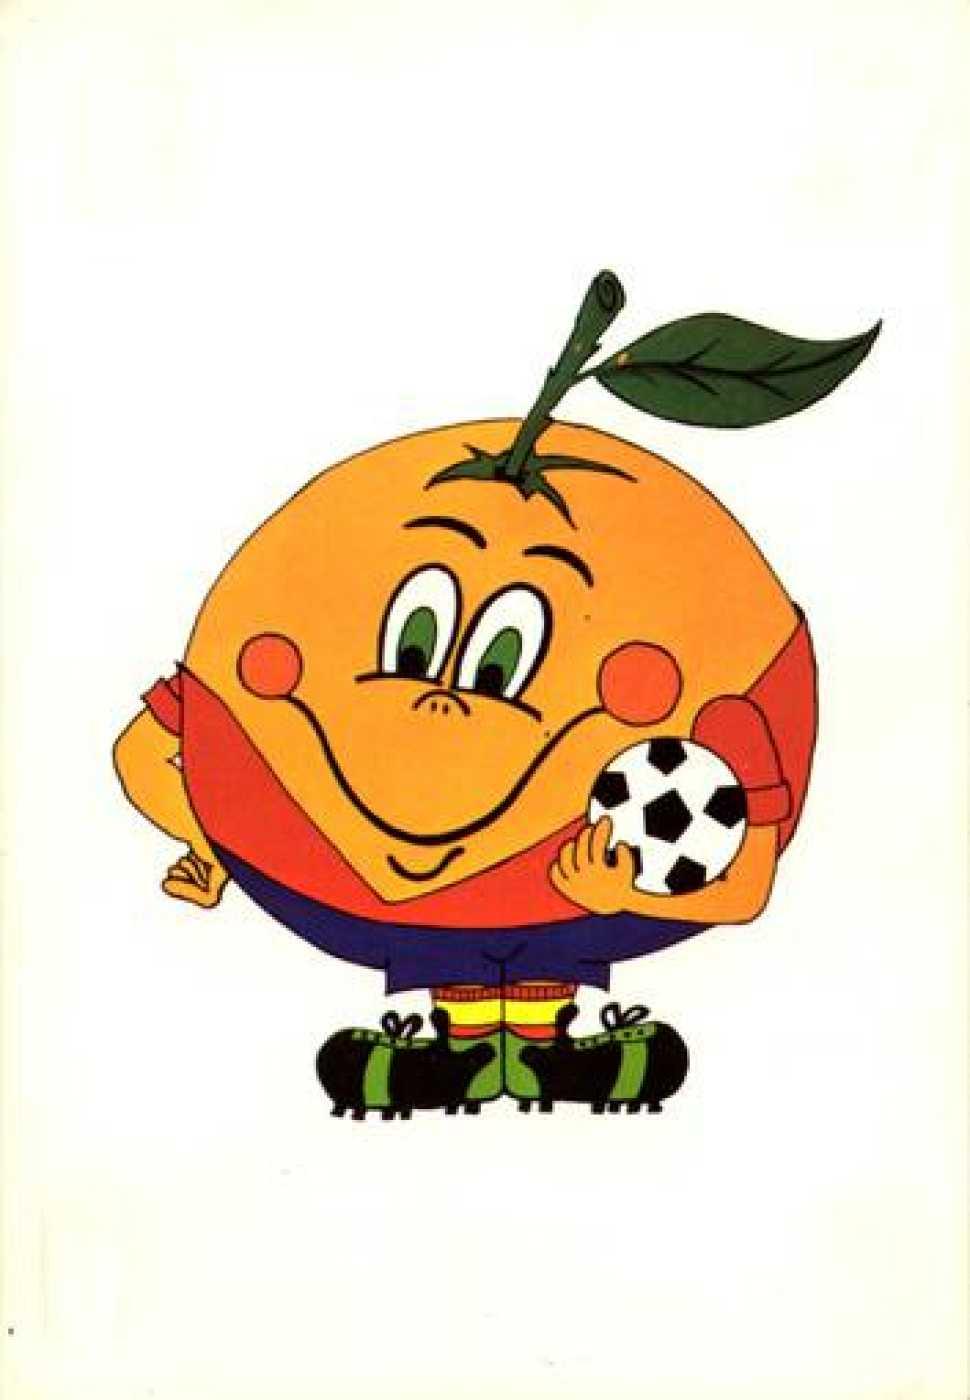 Naranjito, la mascota de España '82